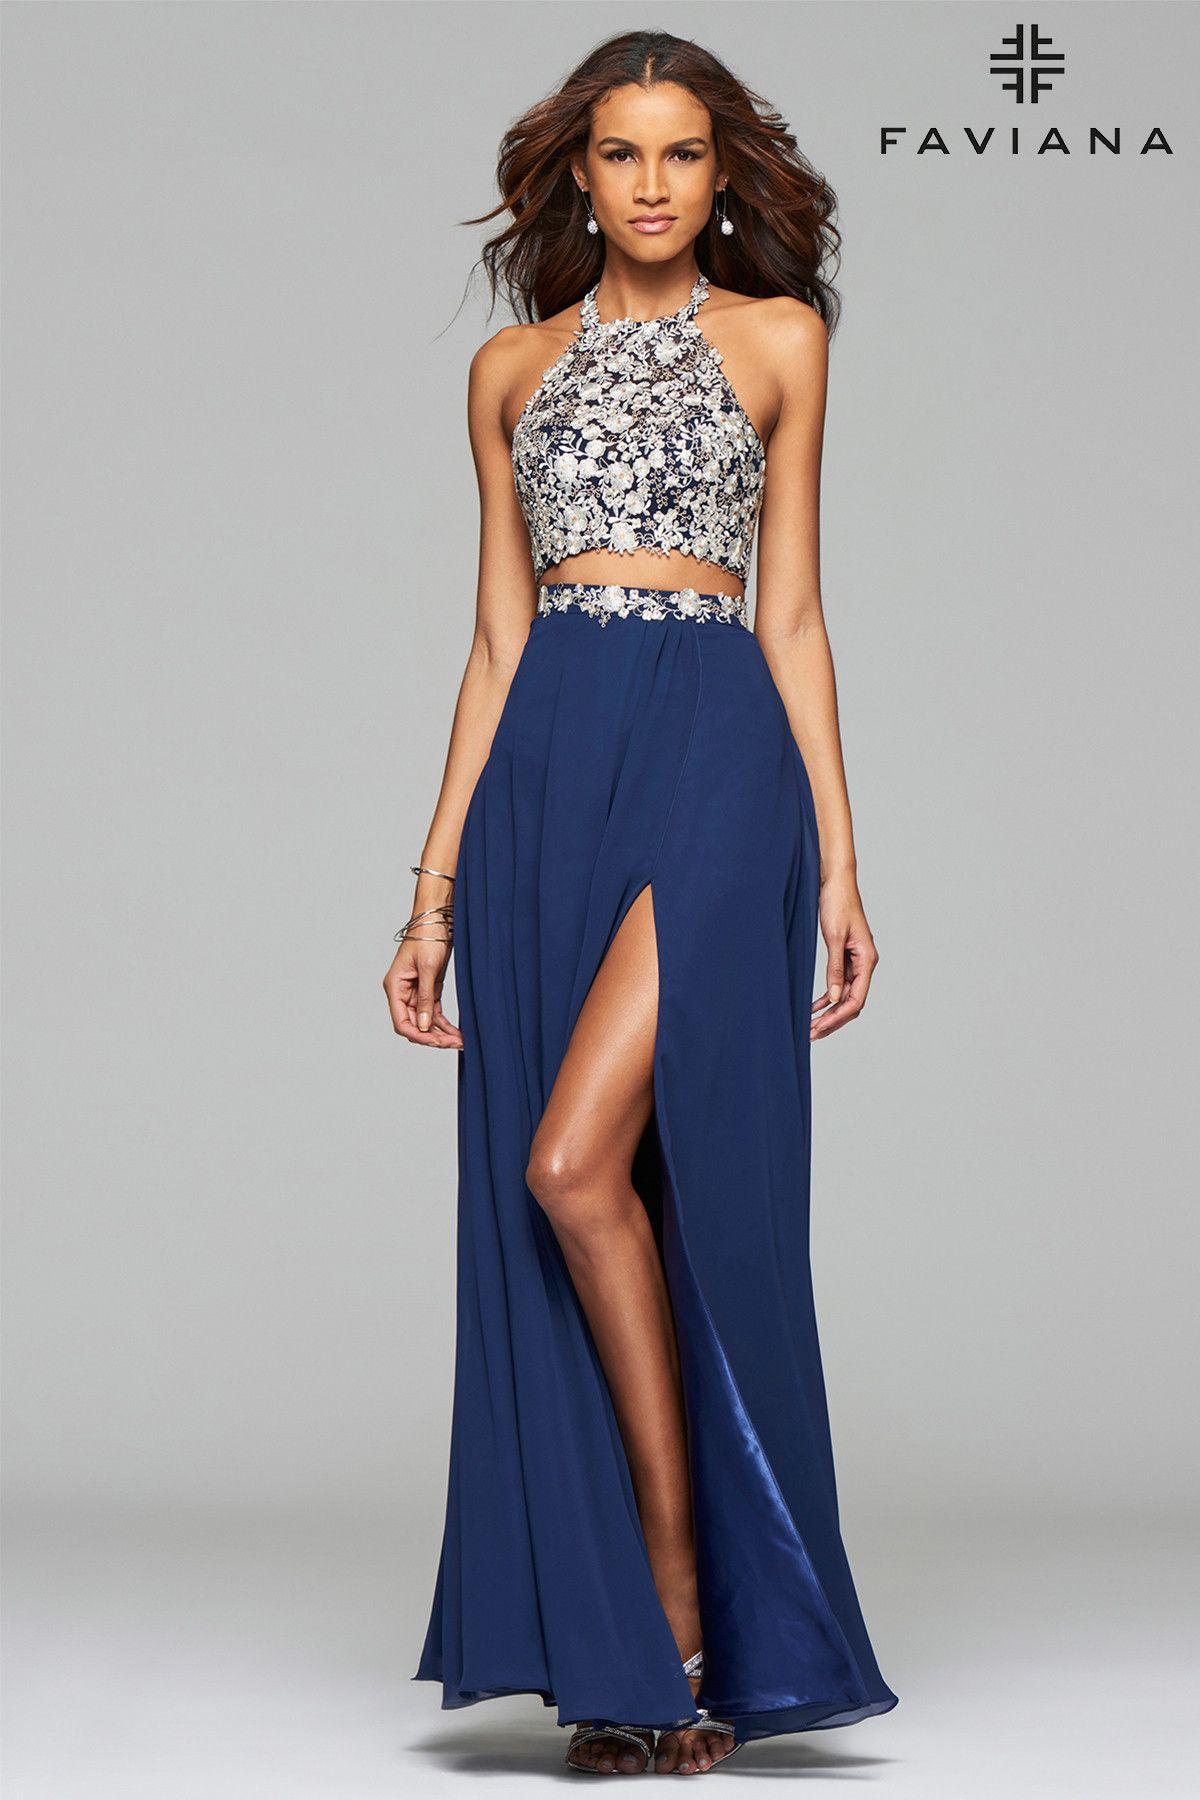 Faviana prom dress style homecomingprom pinterest prom